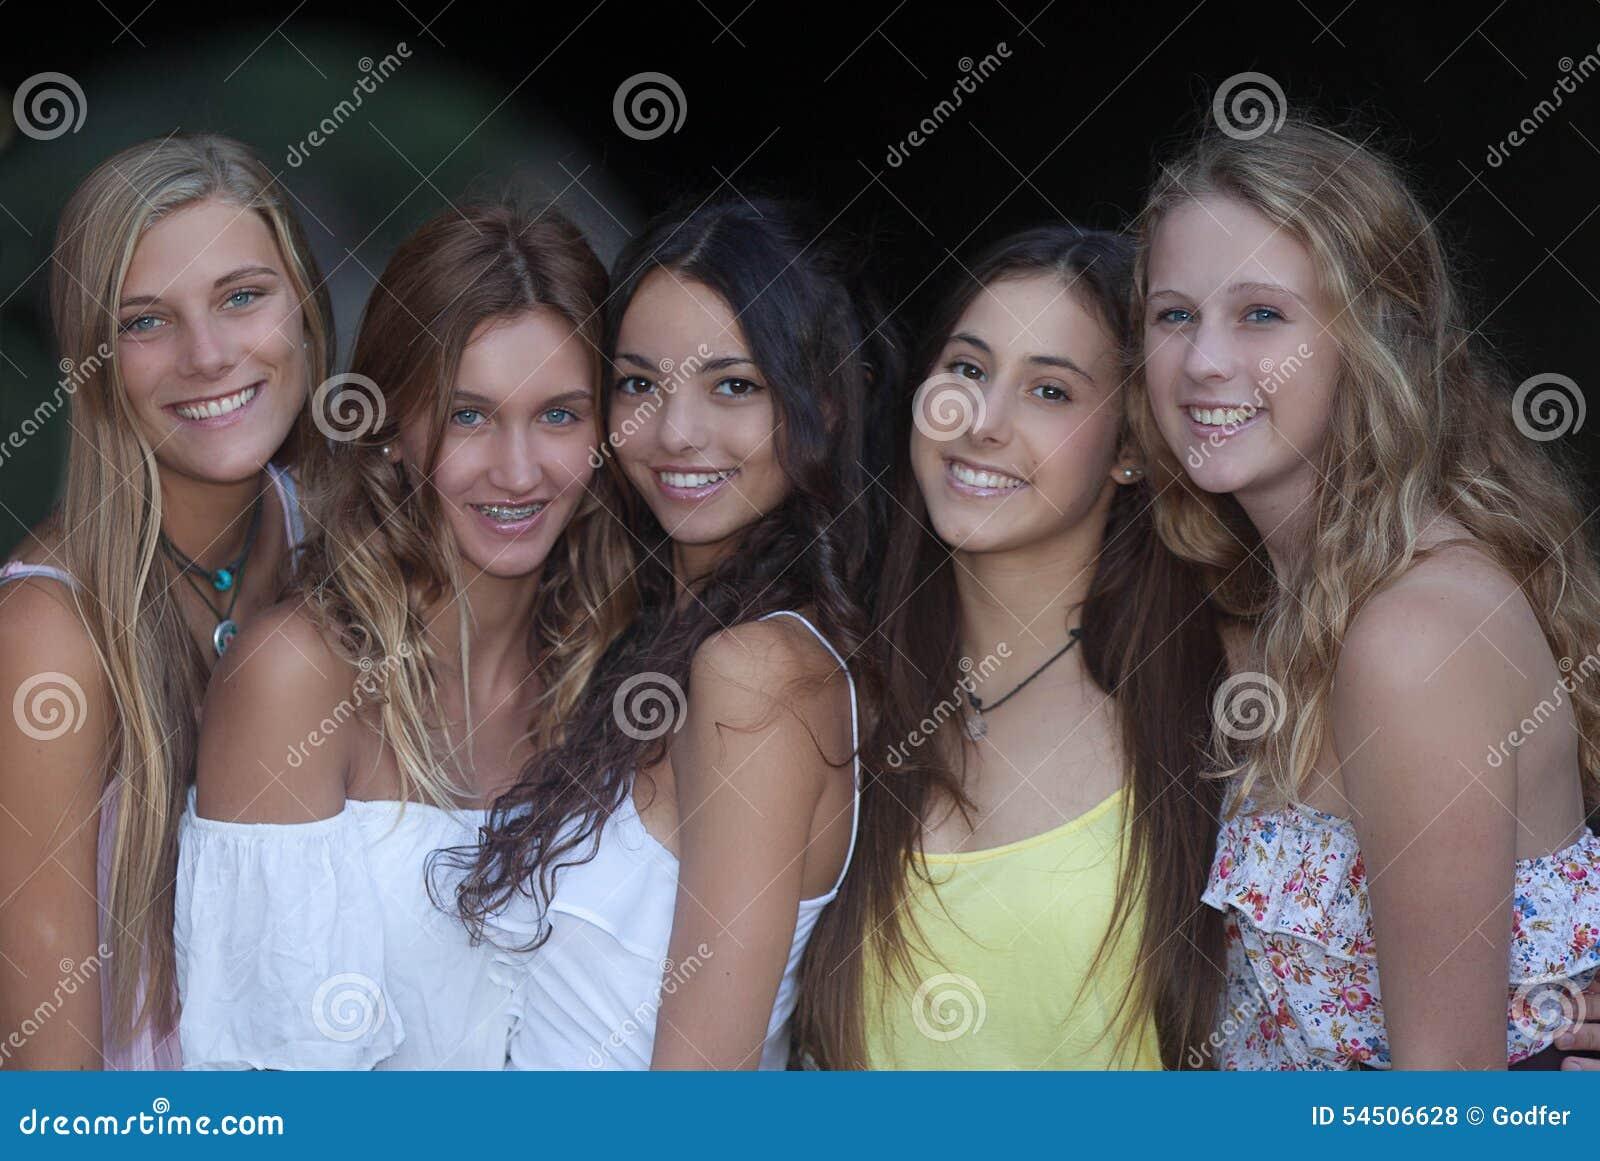 Immagini di ragazze in foto